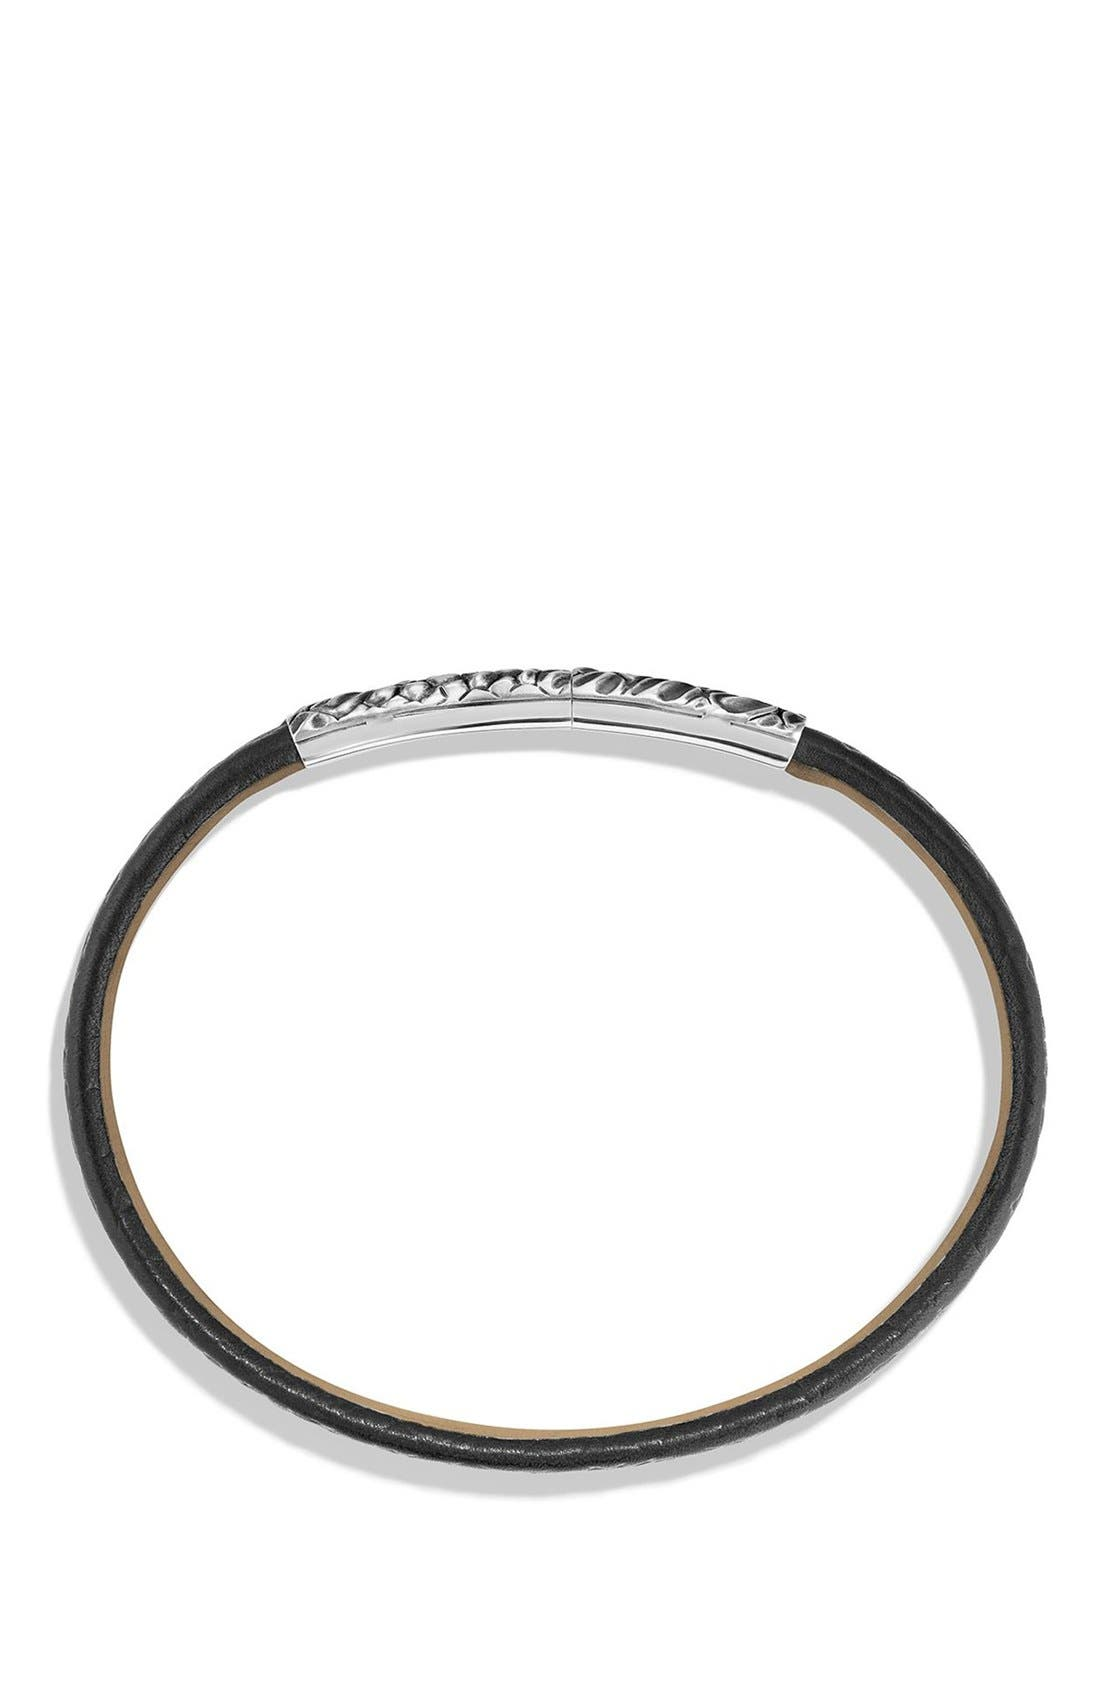 Gator Leather Bracelet,                             Alternate thumbnail 2, color,                             Silver/ Black Leather